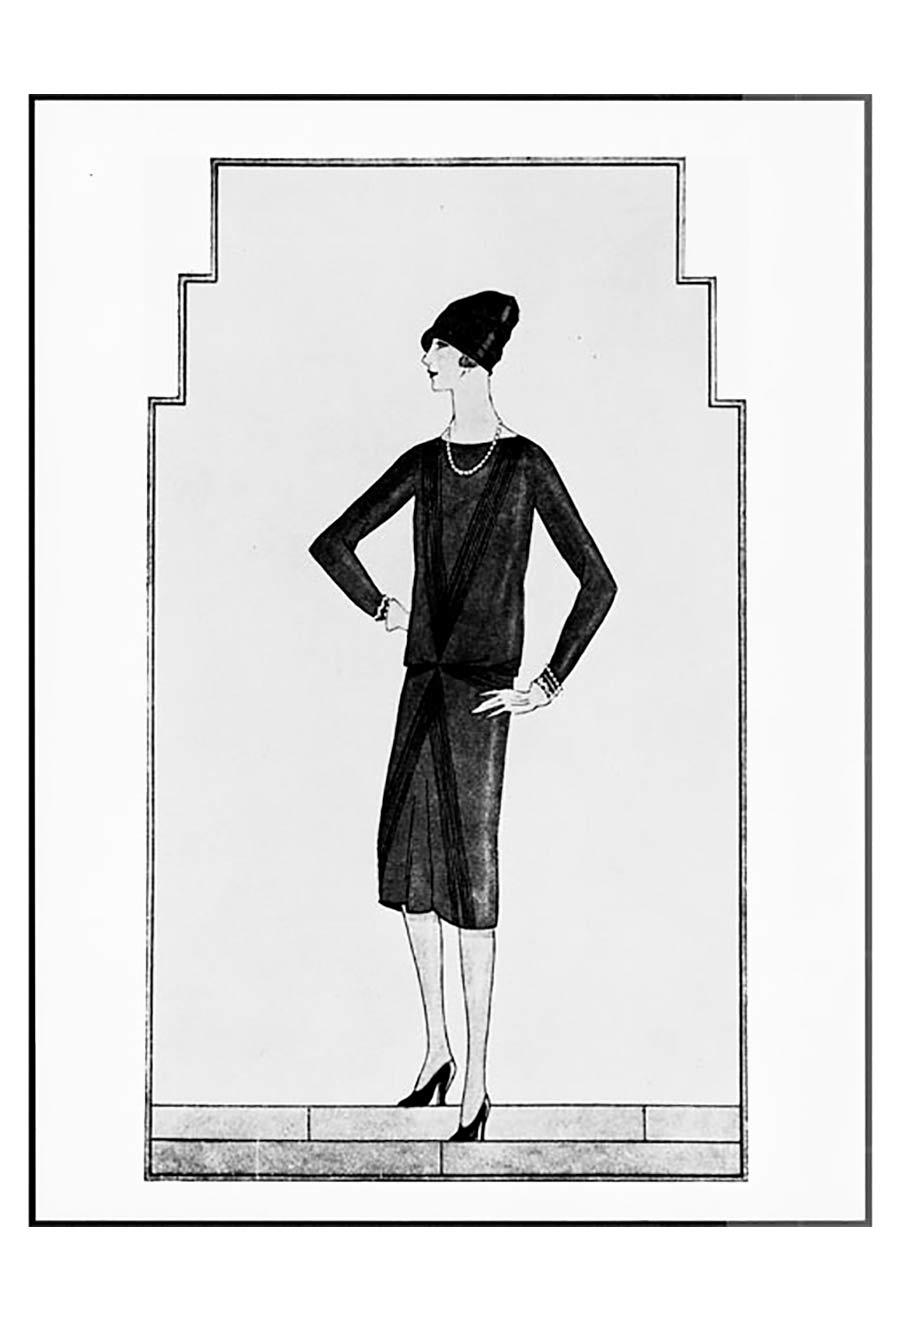 Little Black dress - Chanel stampa d'epoca